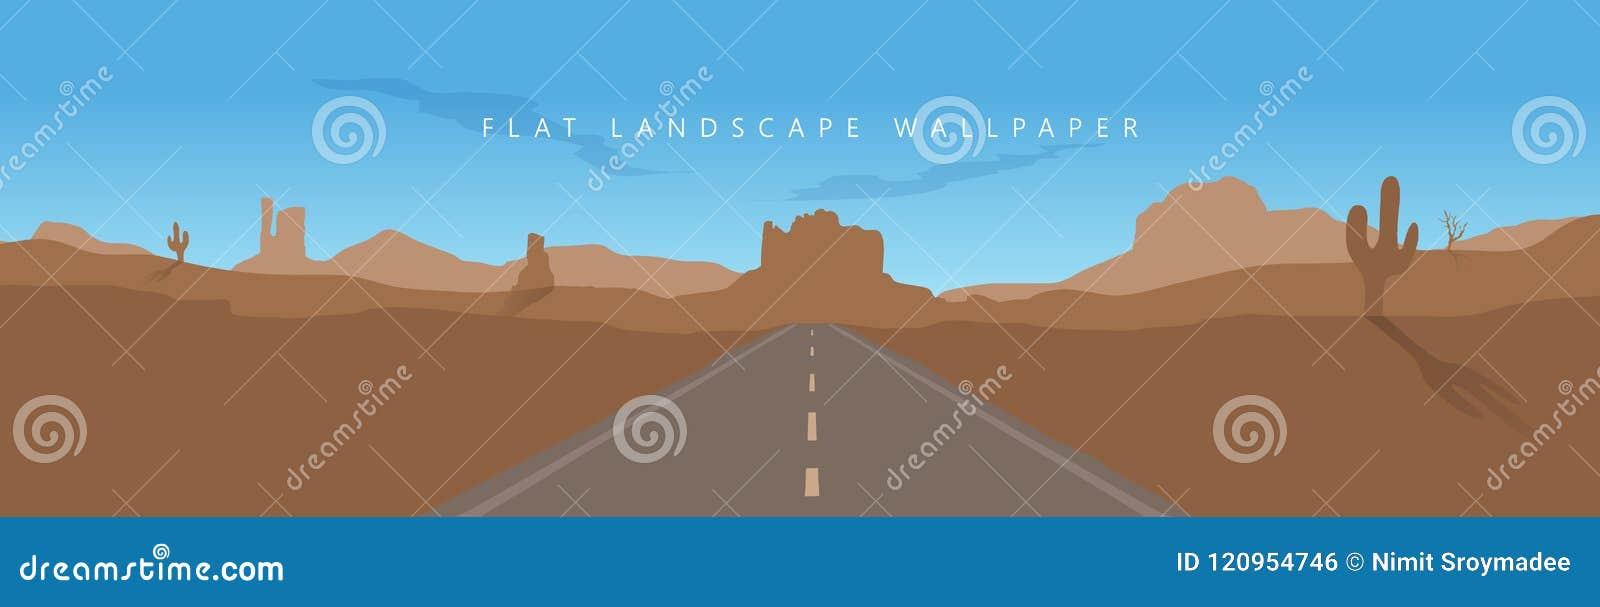 Flat Arizona Landscape Mountain Desert Background Vector Wallpaper